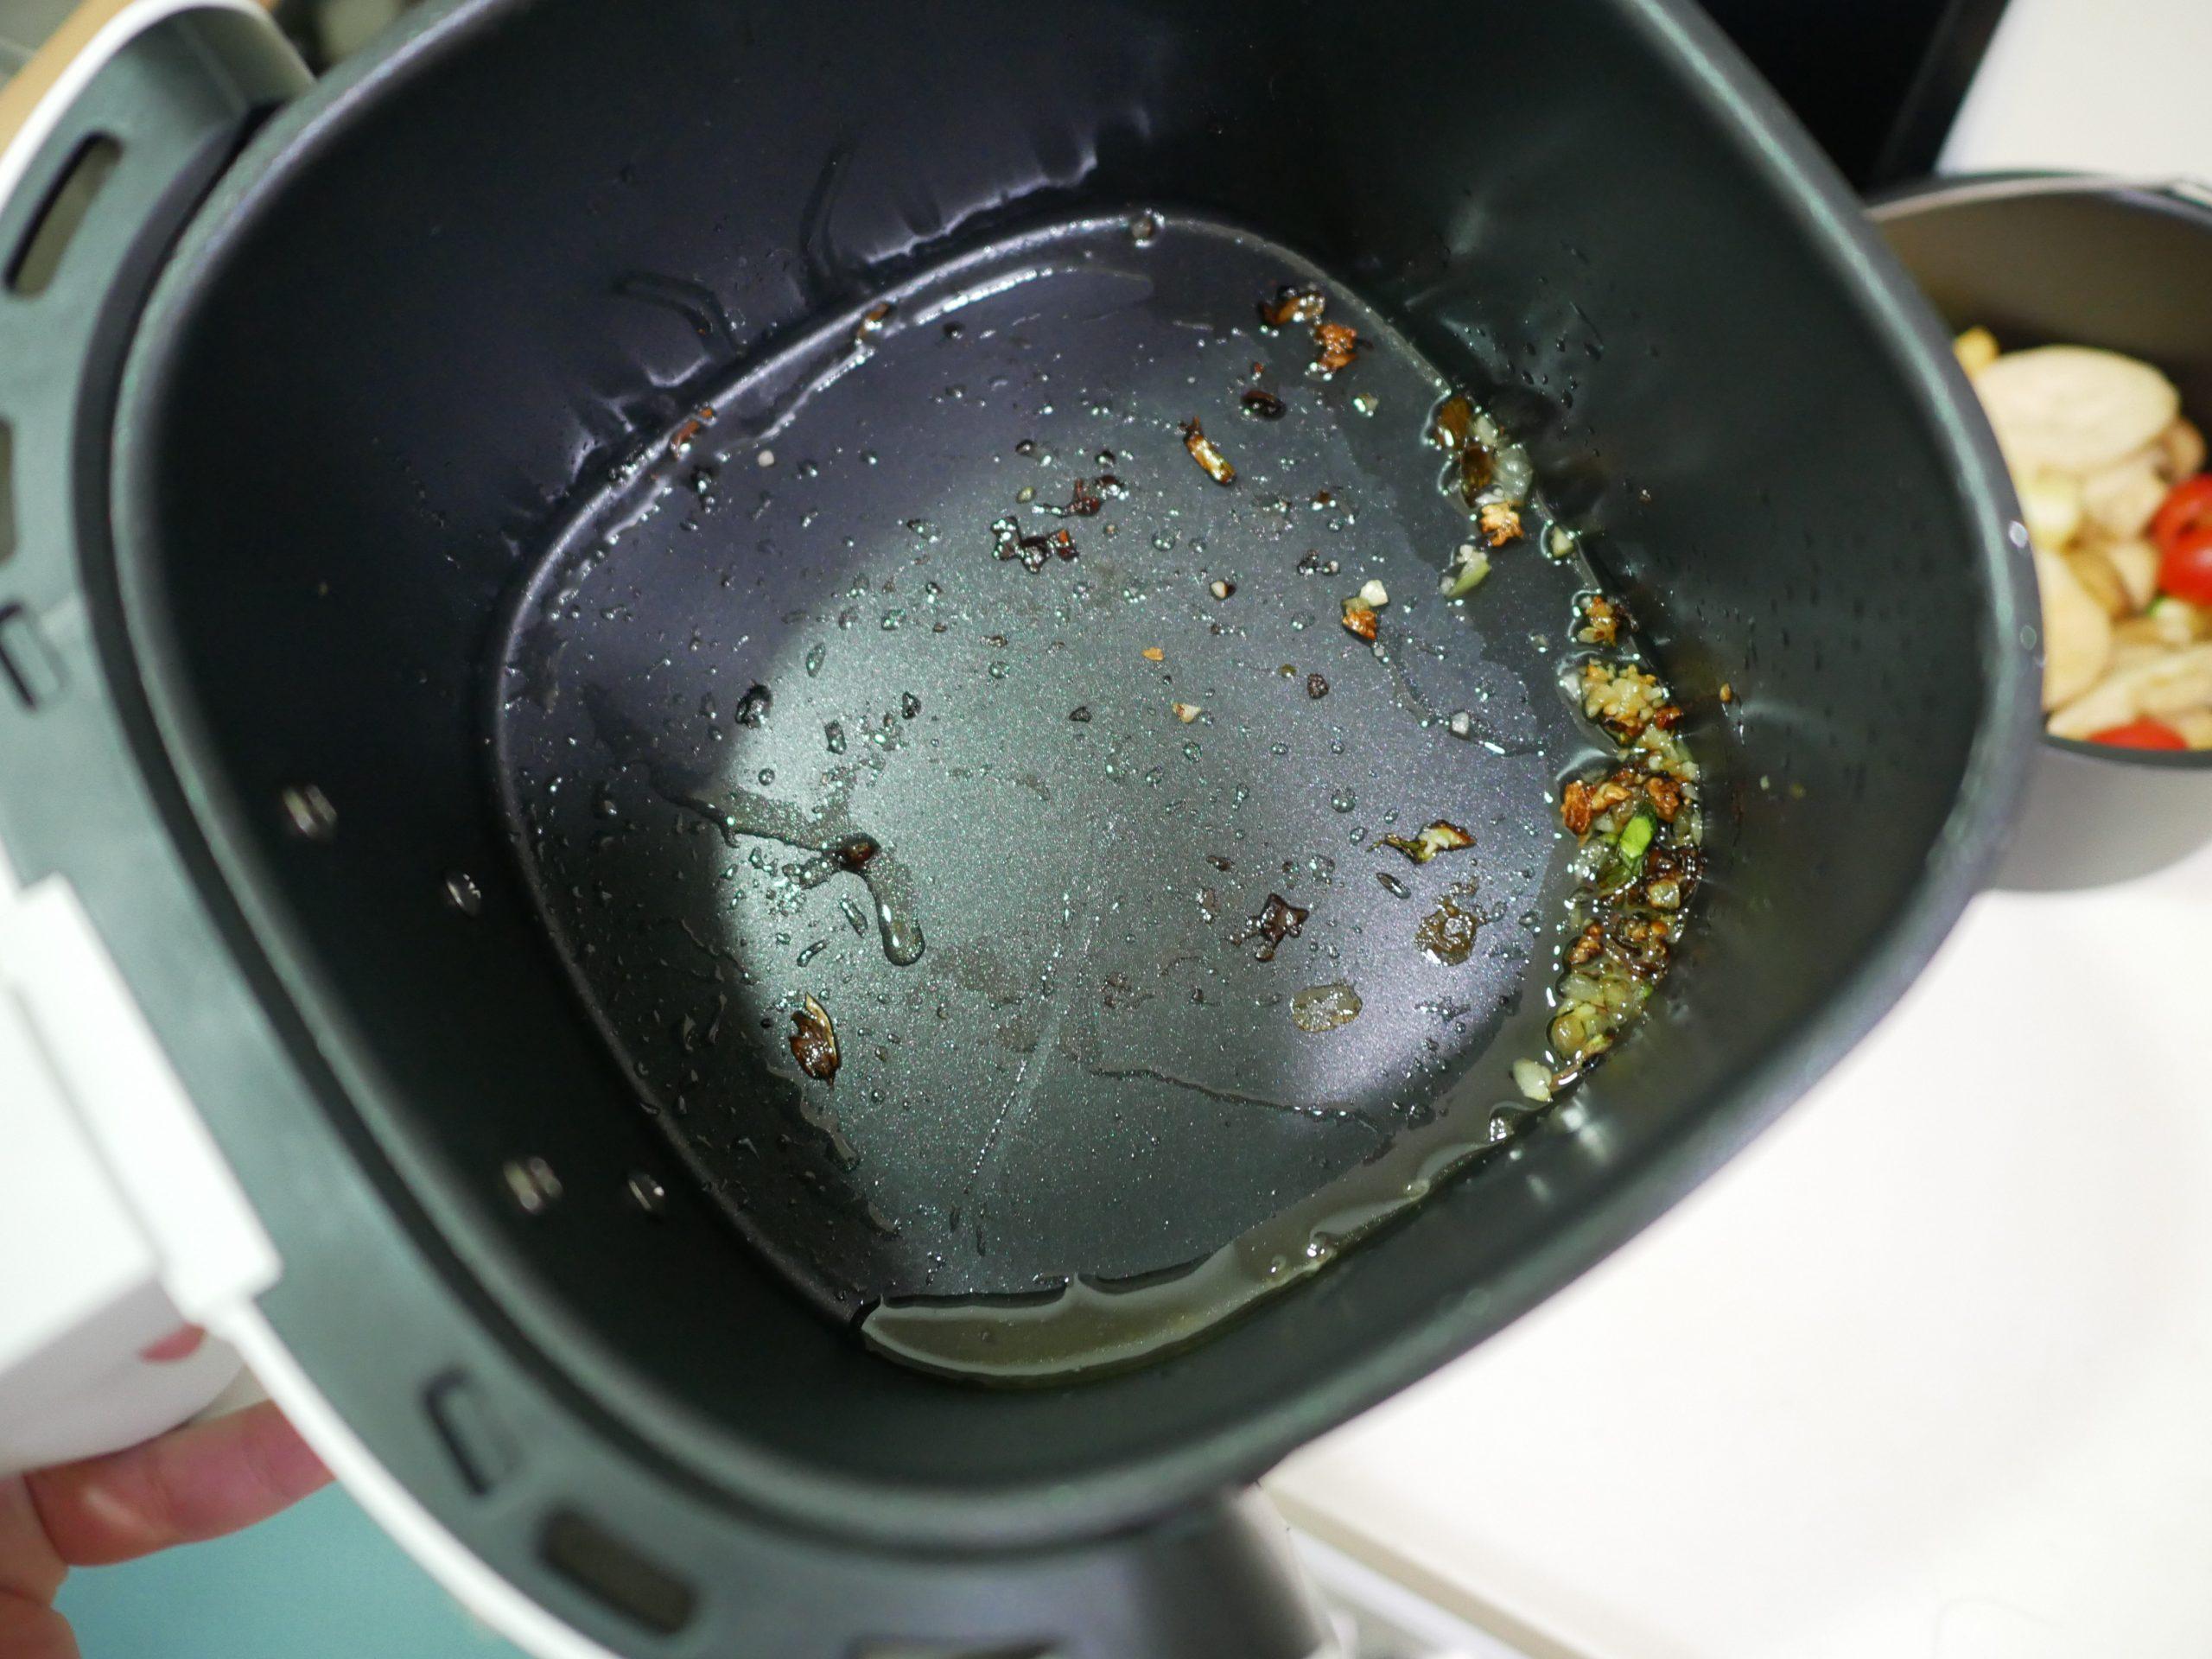 【arlink氣炸鍋團購】小白同學,超美的氣炸鍋,文內有食譜做法 @小環妞 幸福足跡